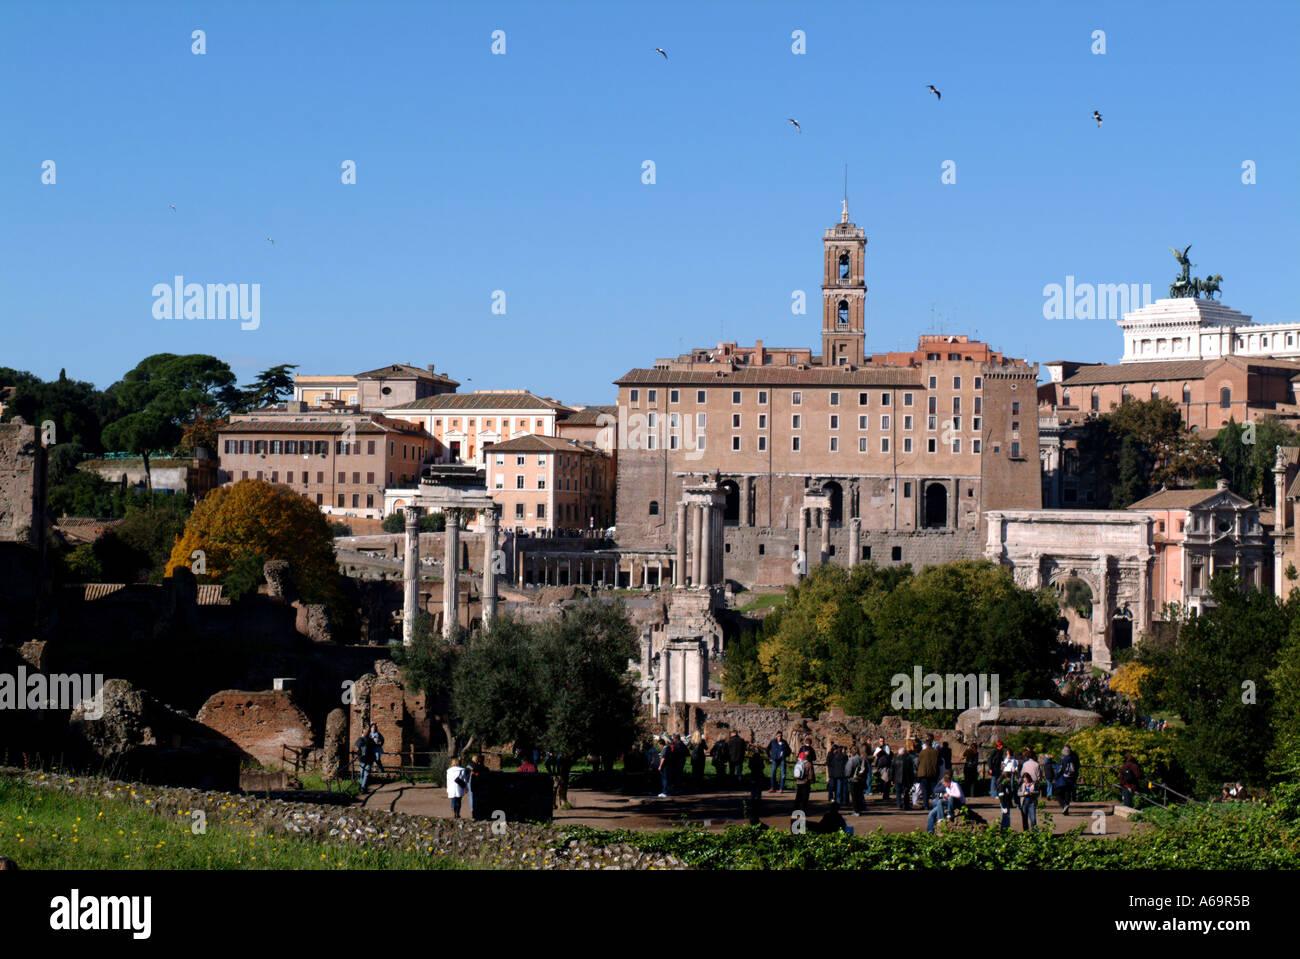 The Palatine Rome Italy November 2004 - Stock Image